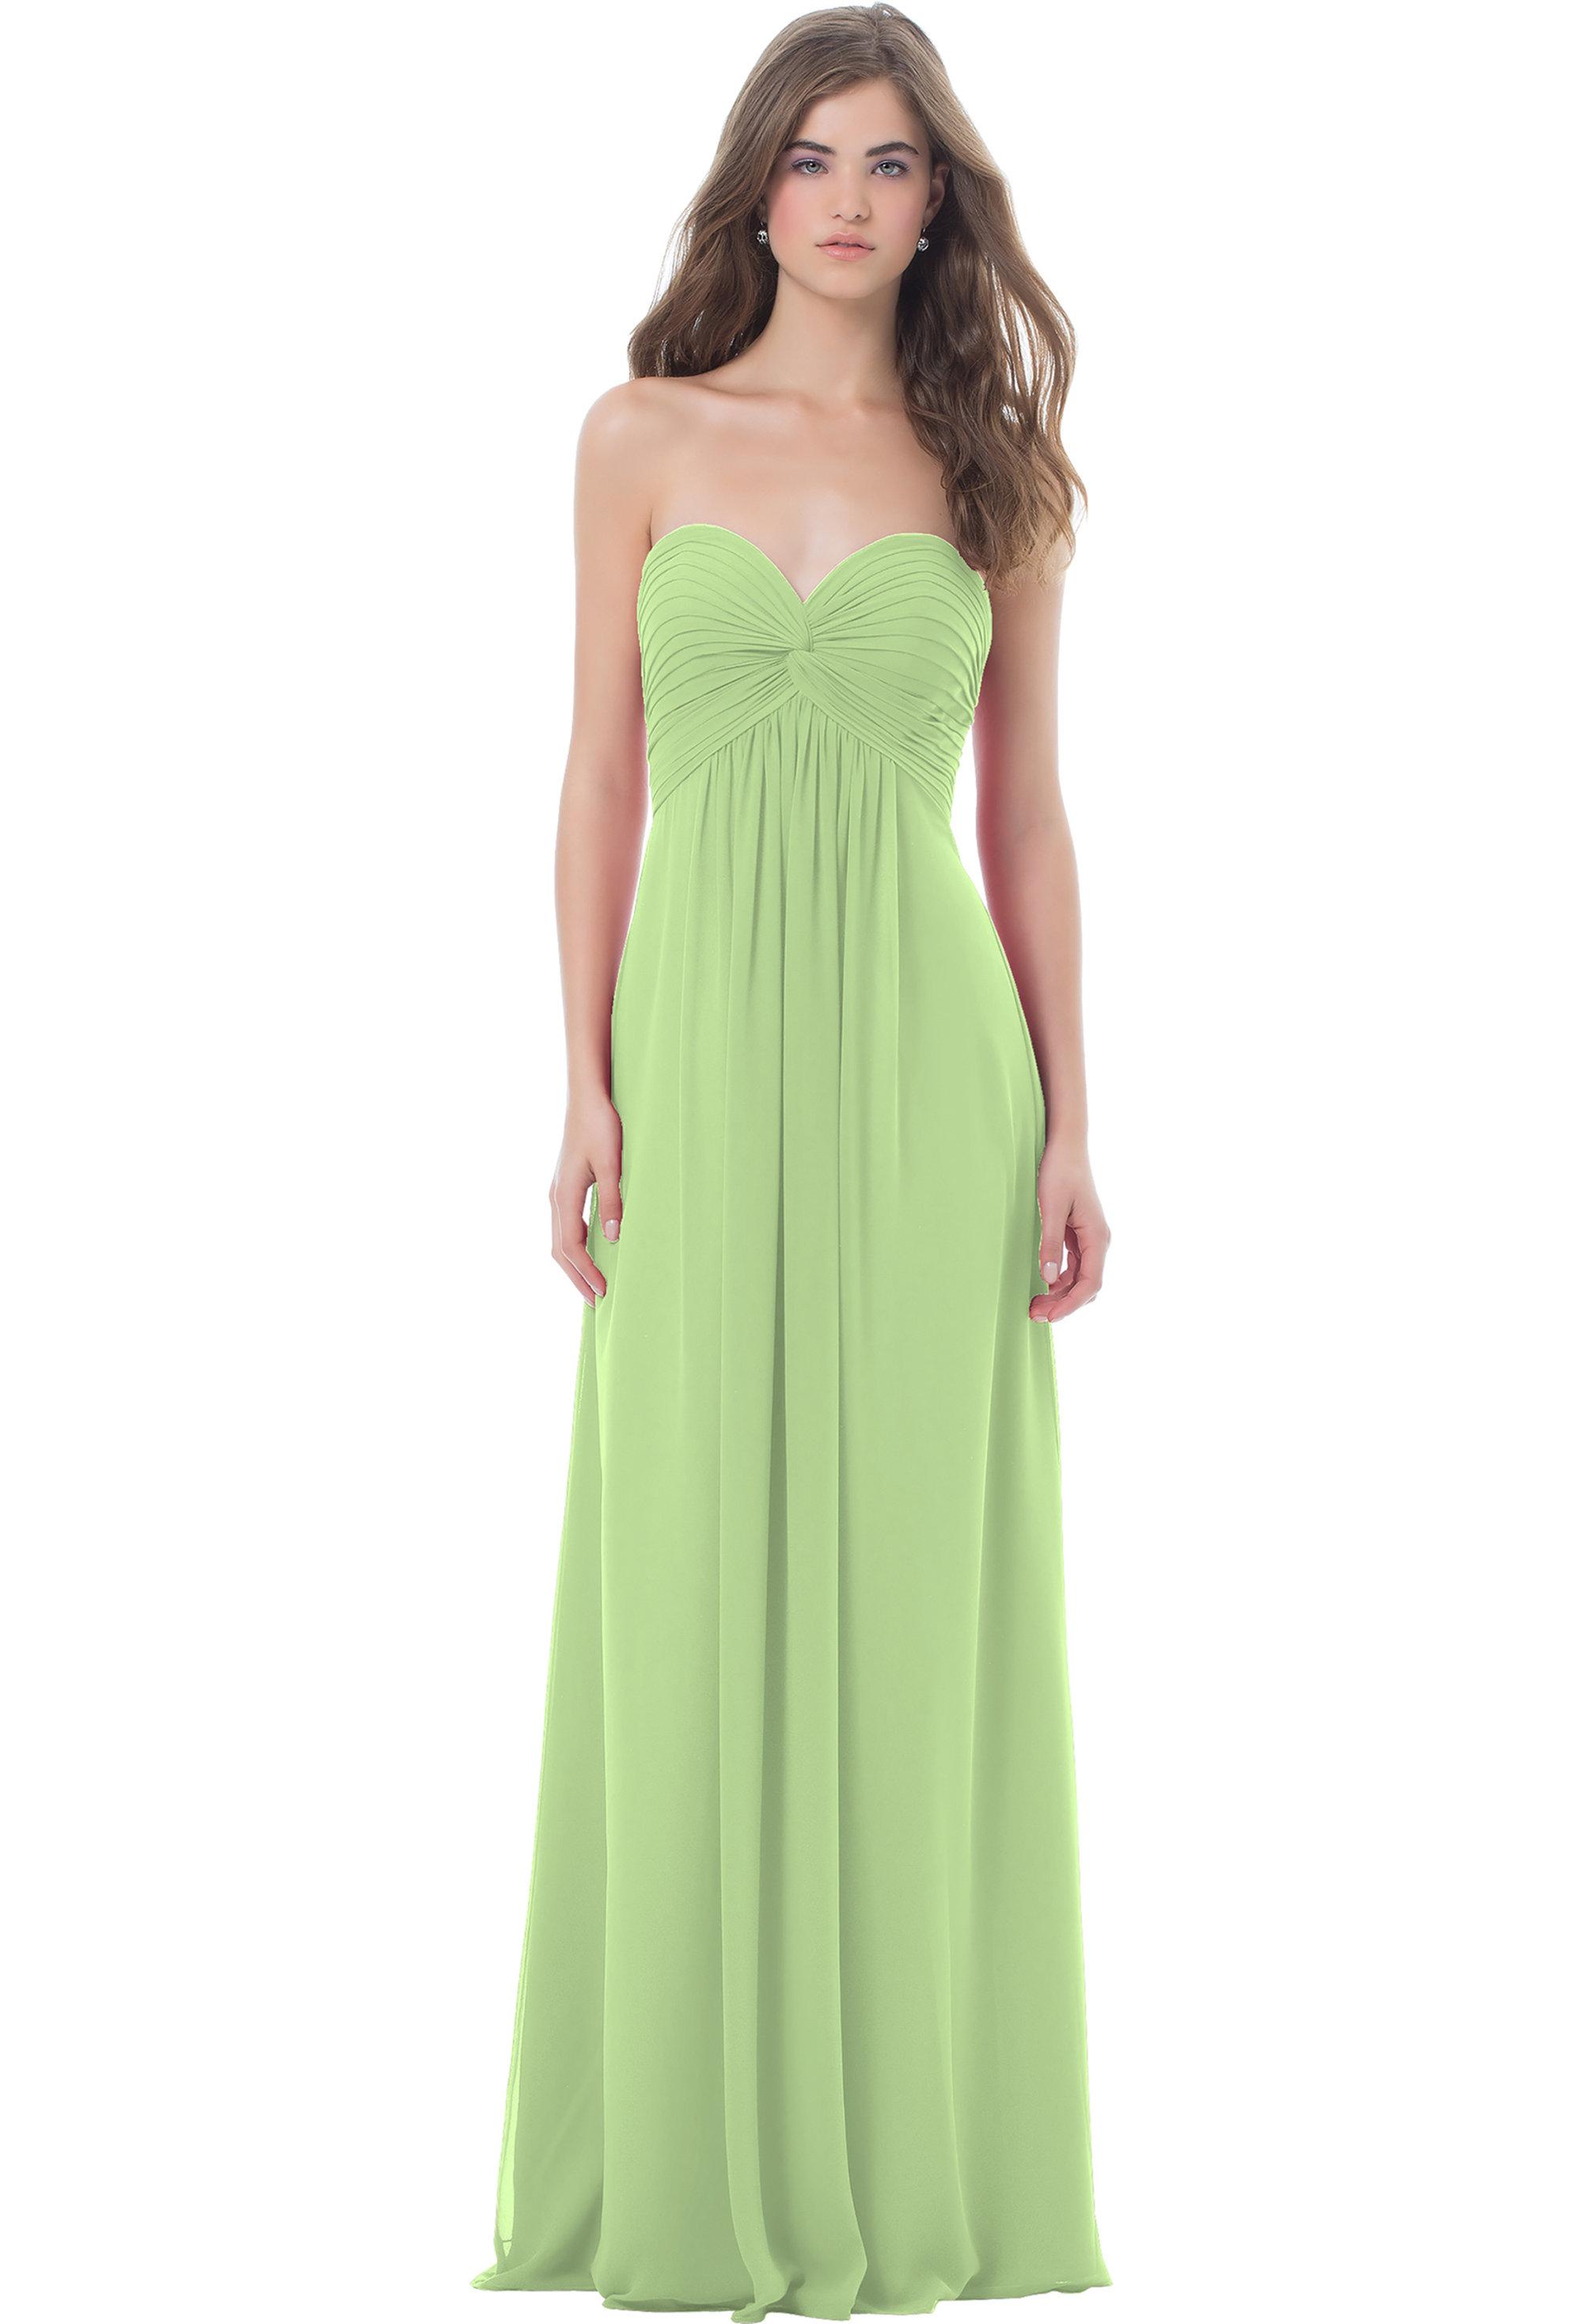 Bill Levkoff PISTACHIO Chiffon Sweetheart Floor Length gown, $224.00 Front